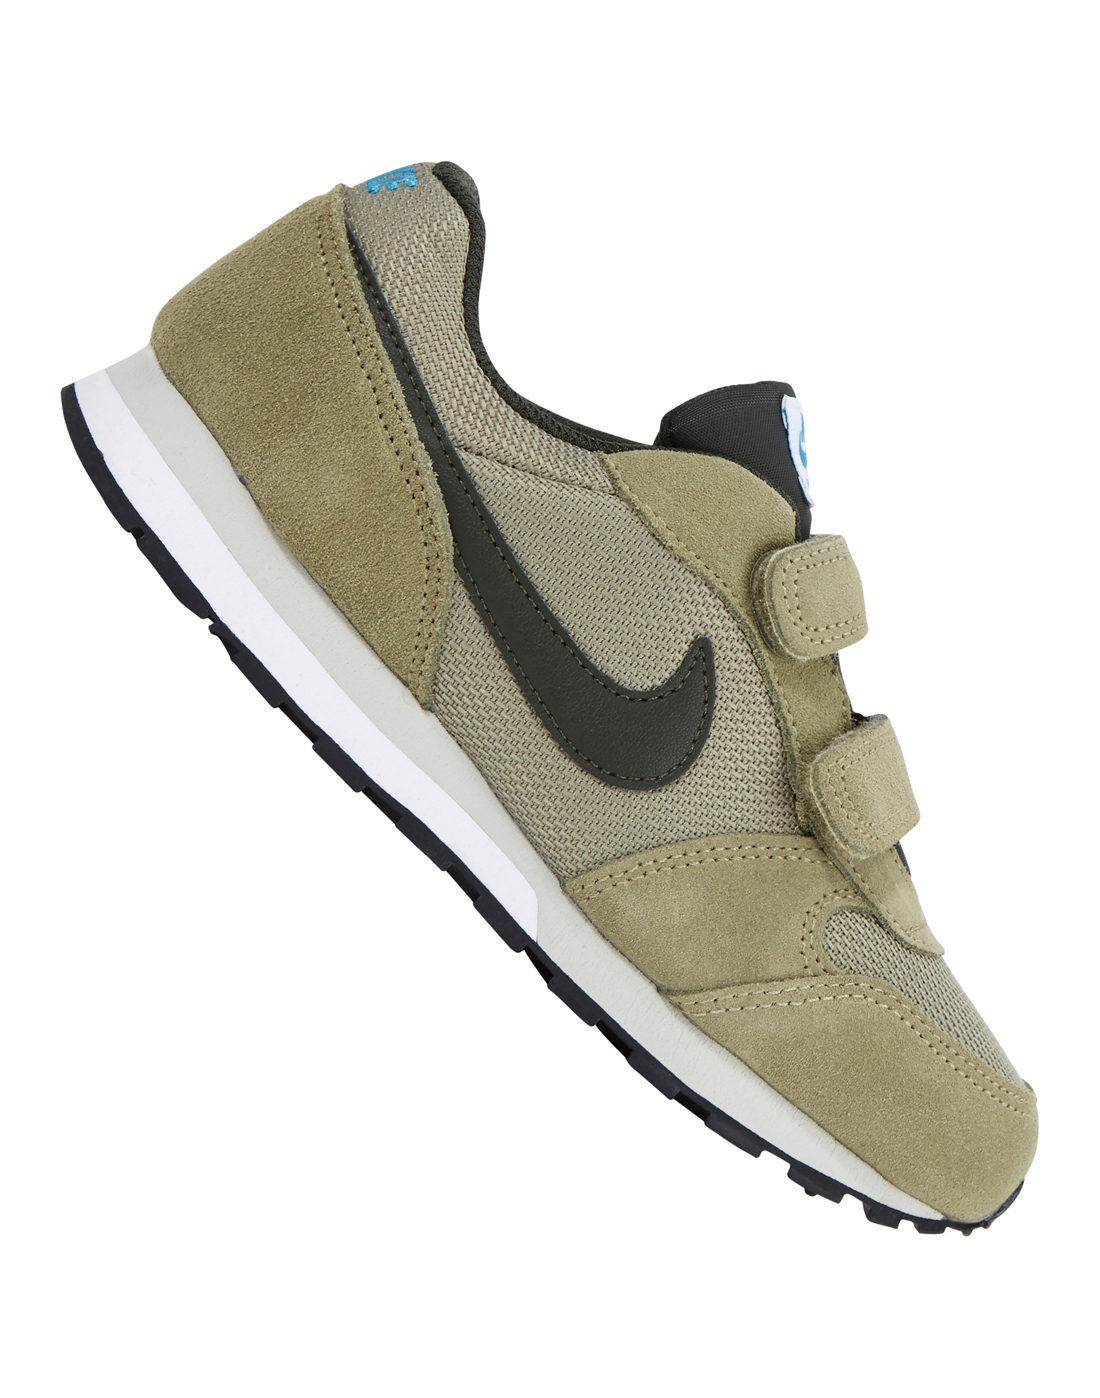 266f7989d6f1b1 Young Boys Nike MD Runner 2